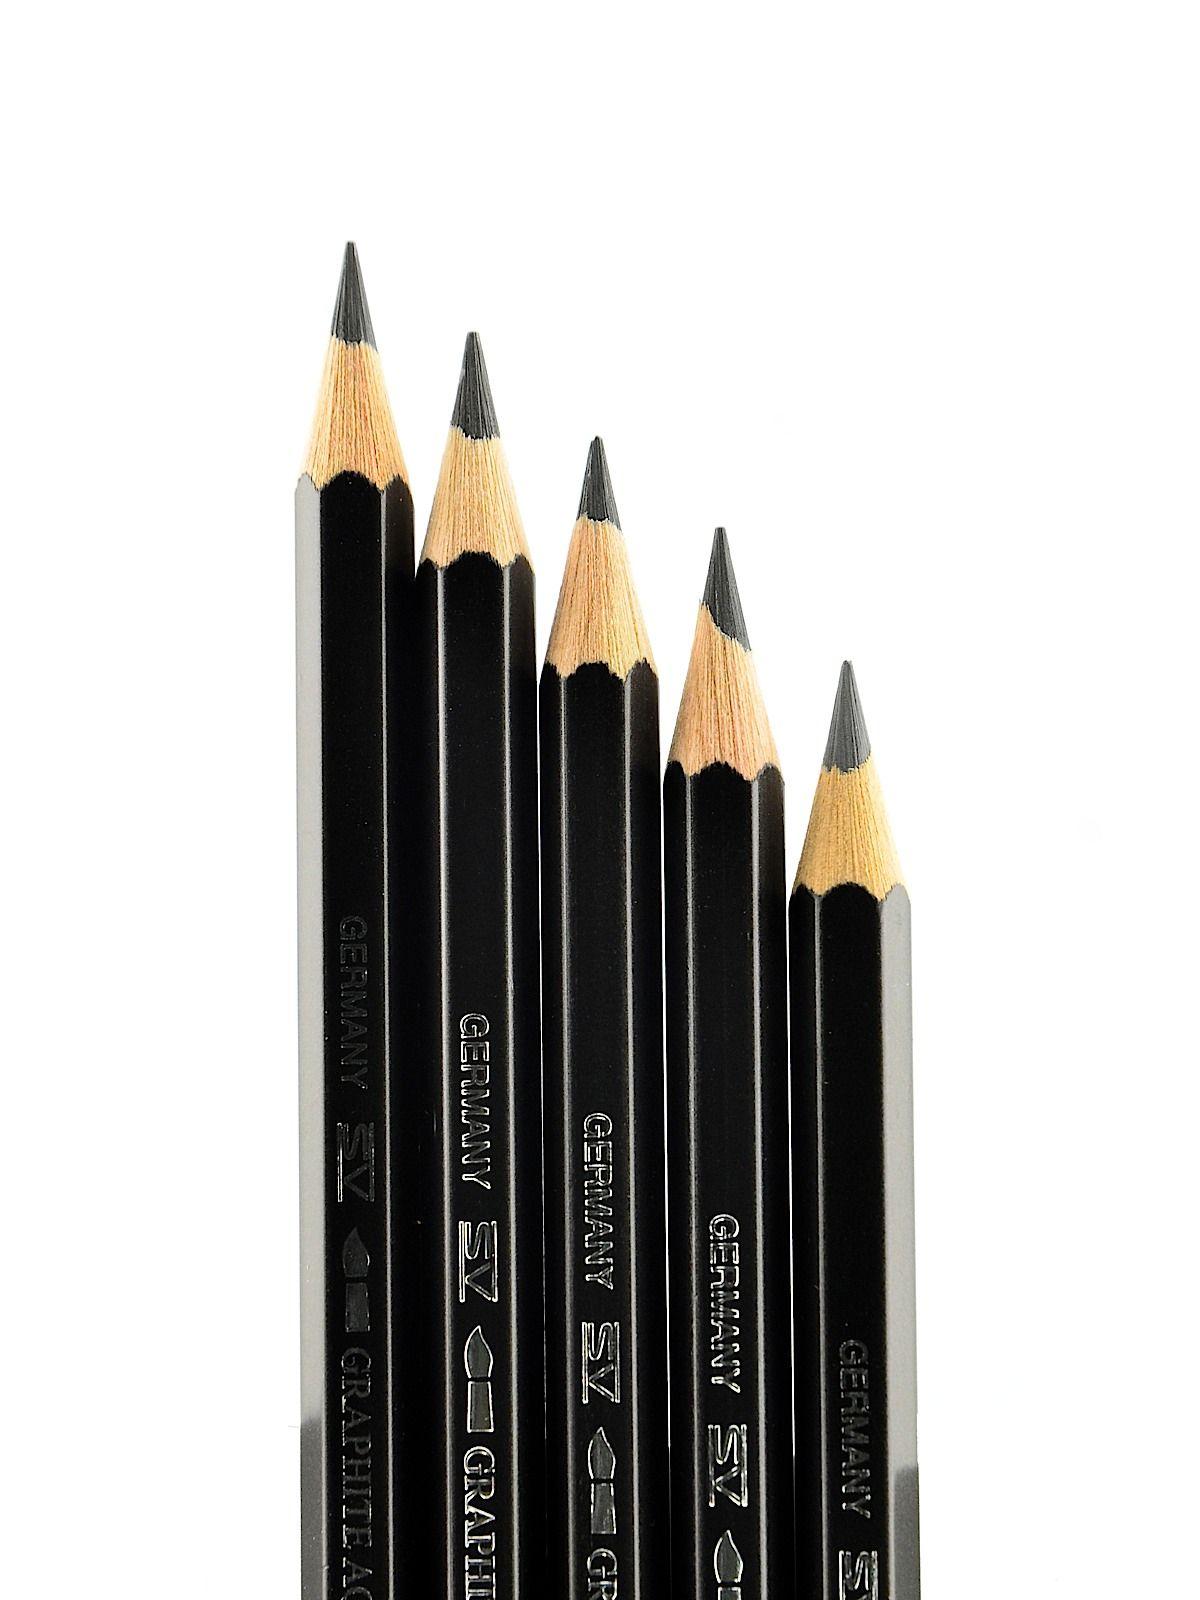 Faber Castell Graphite Aquarelle Water Soluble Pencils Spon